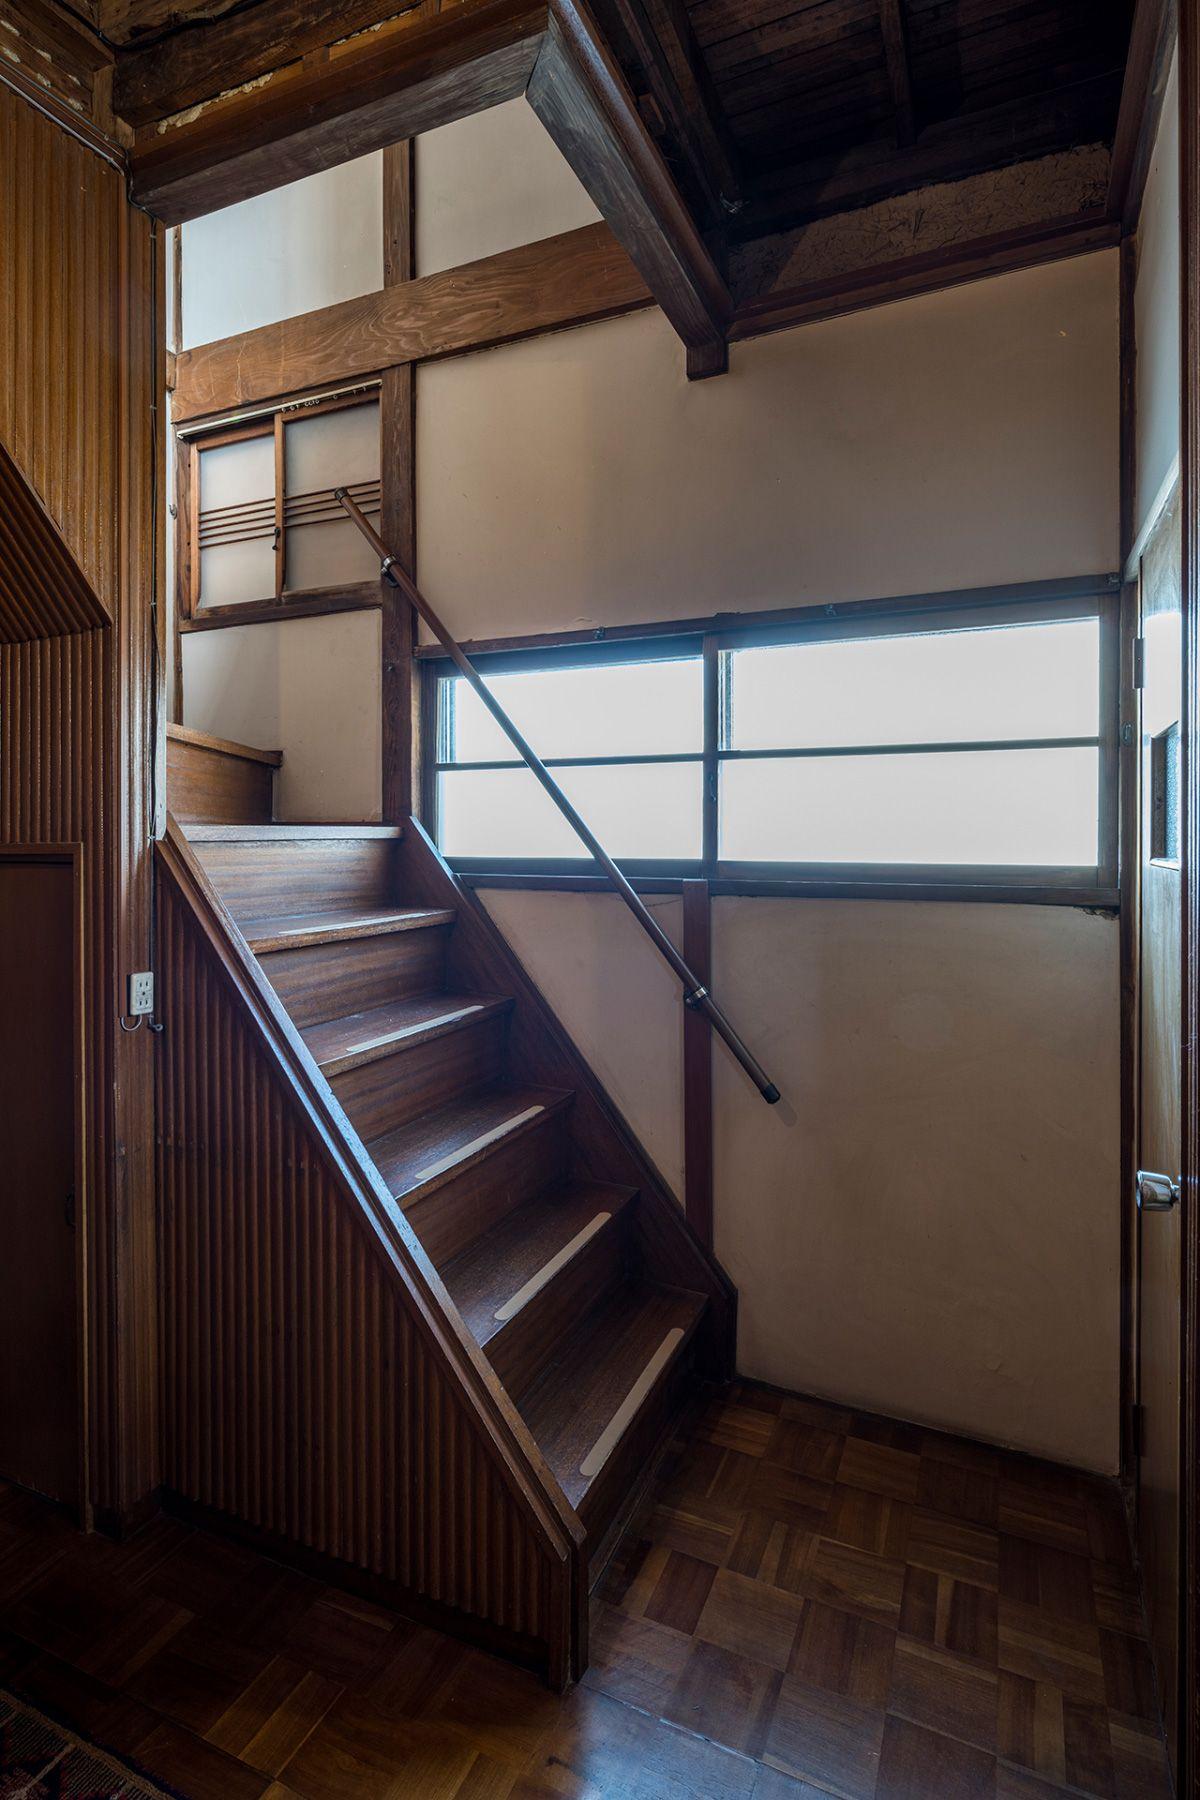 mado/個人宅1F 階段